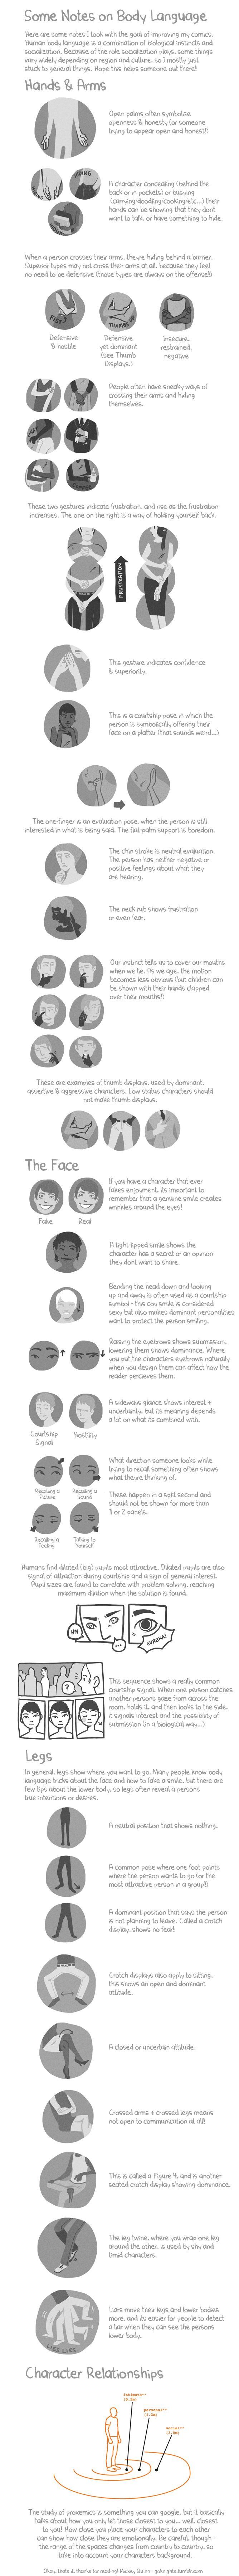 Body language #infographic #body language #non-verbal communication